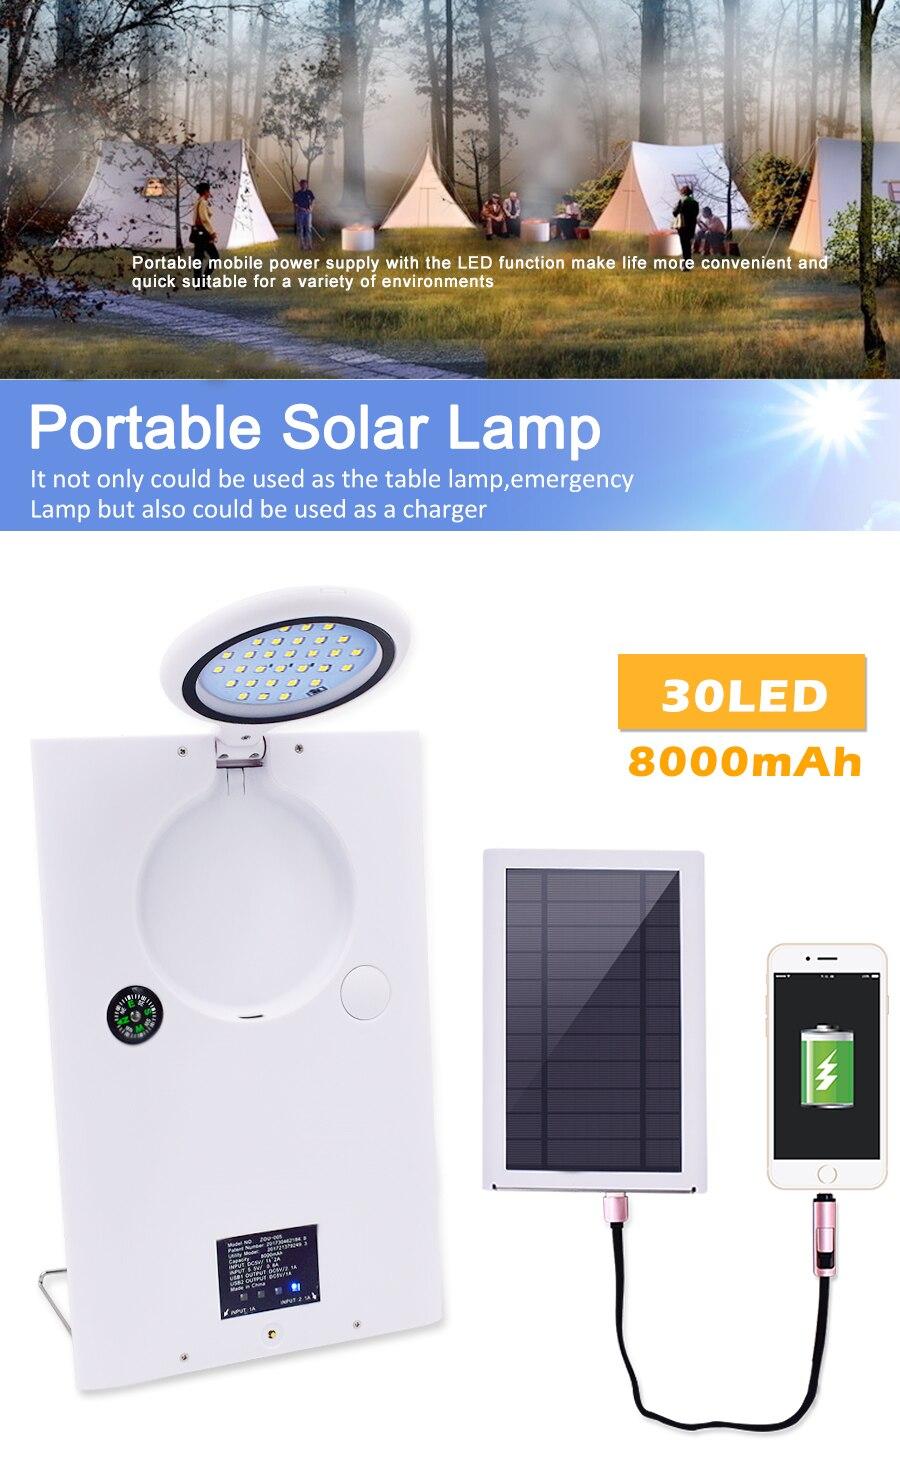 30 LED portátil Luz de energía Solar al aire libre impermeable luces de campamento luz nocturna 8000Mah cargador de teléfono móvil lámpara de mesa de escritorio